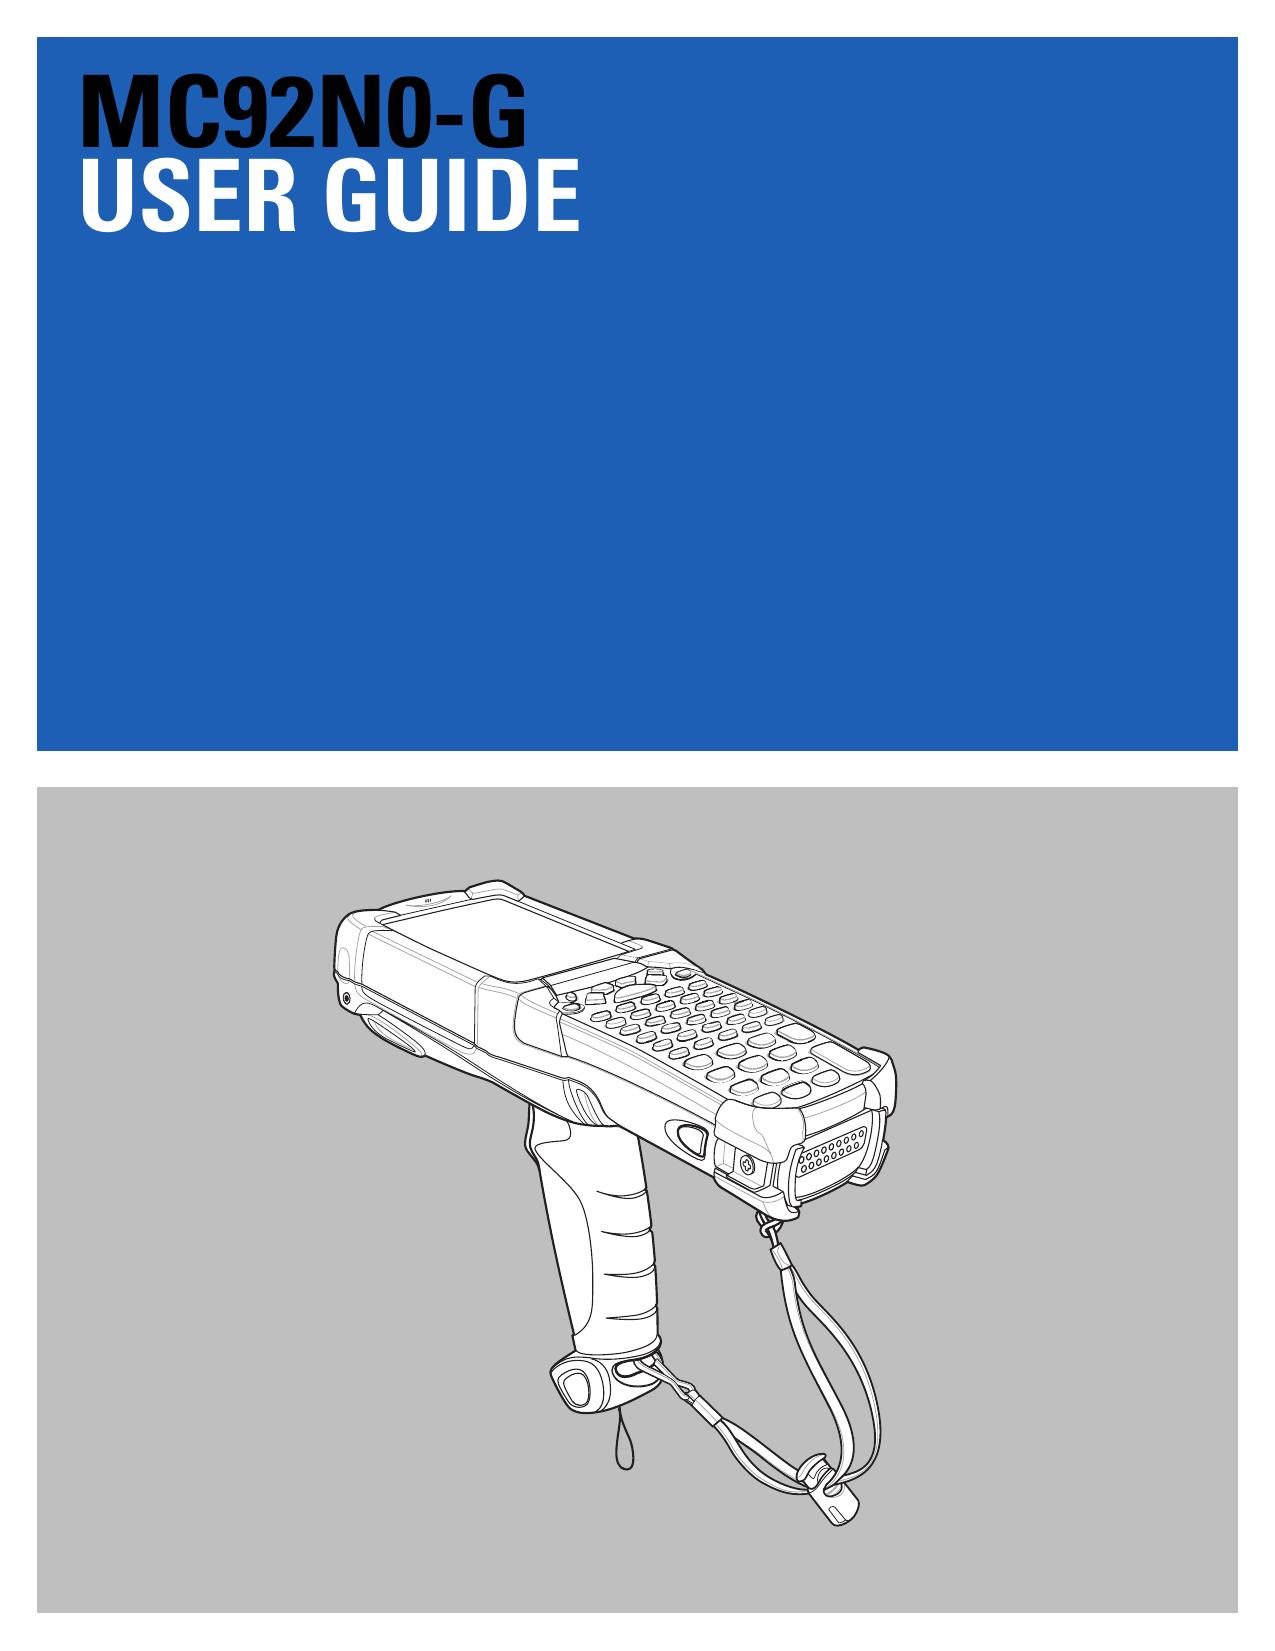 MC92N0-G User Guide - Motorola Solutions | manualzz com